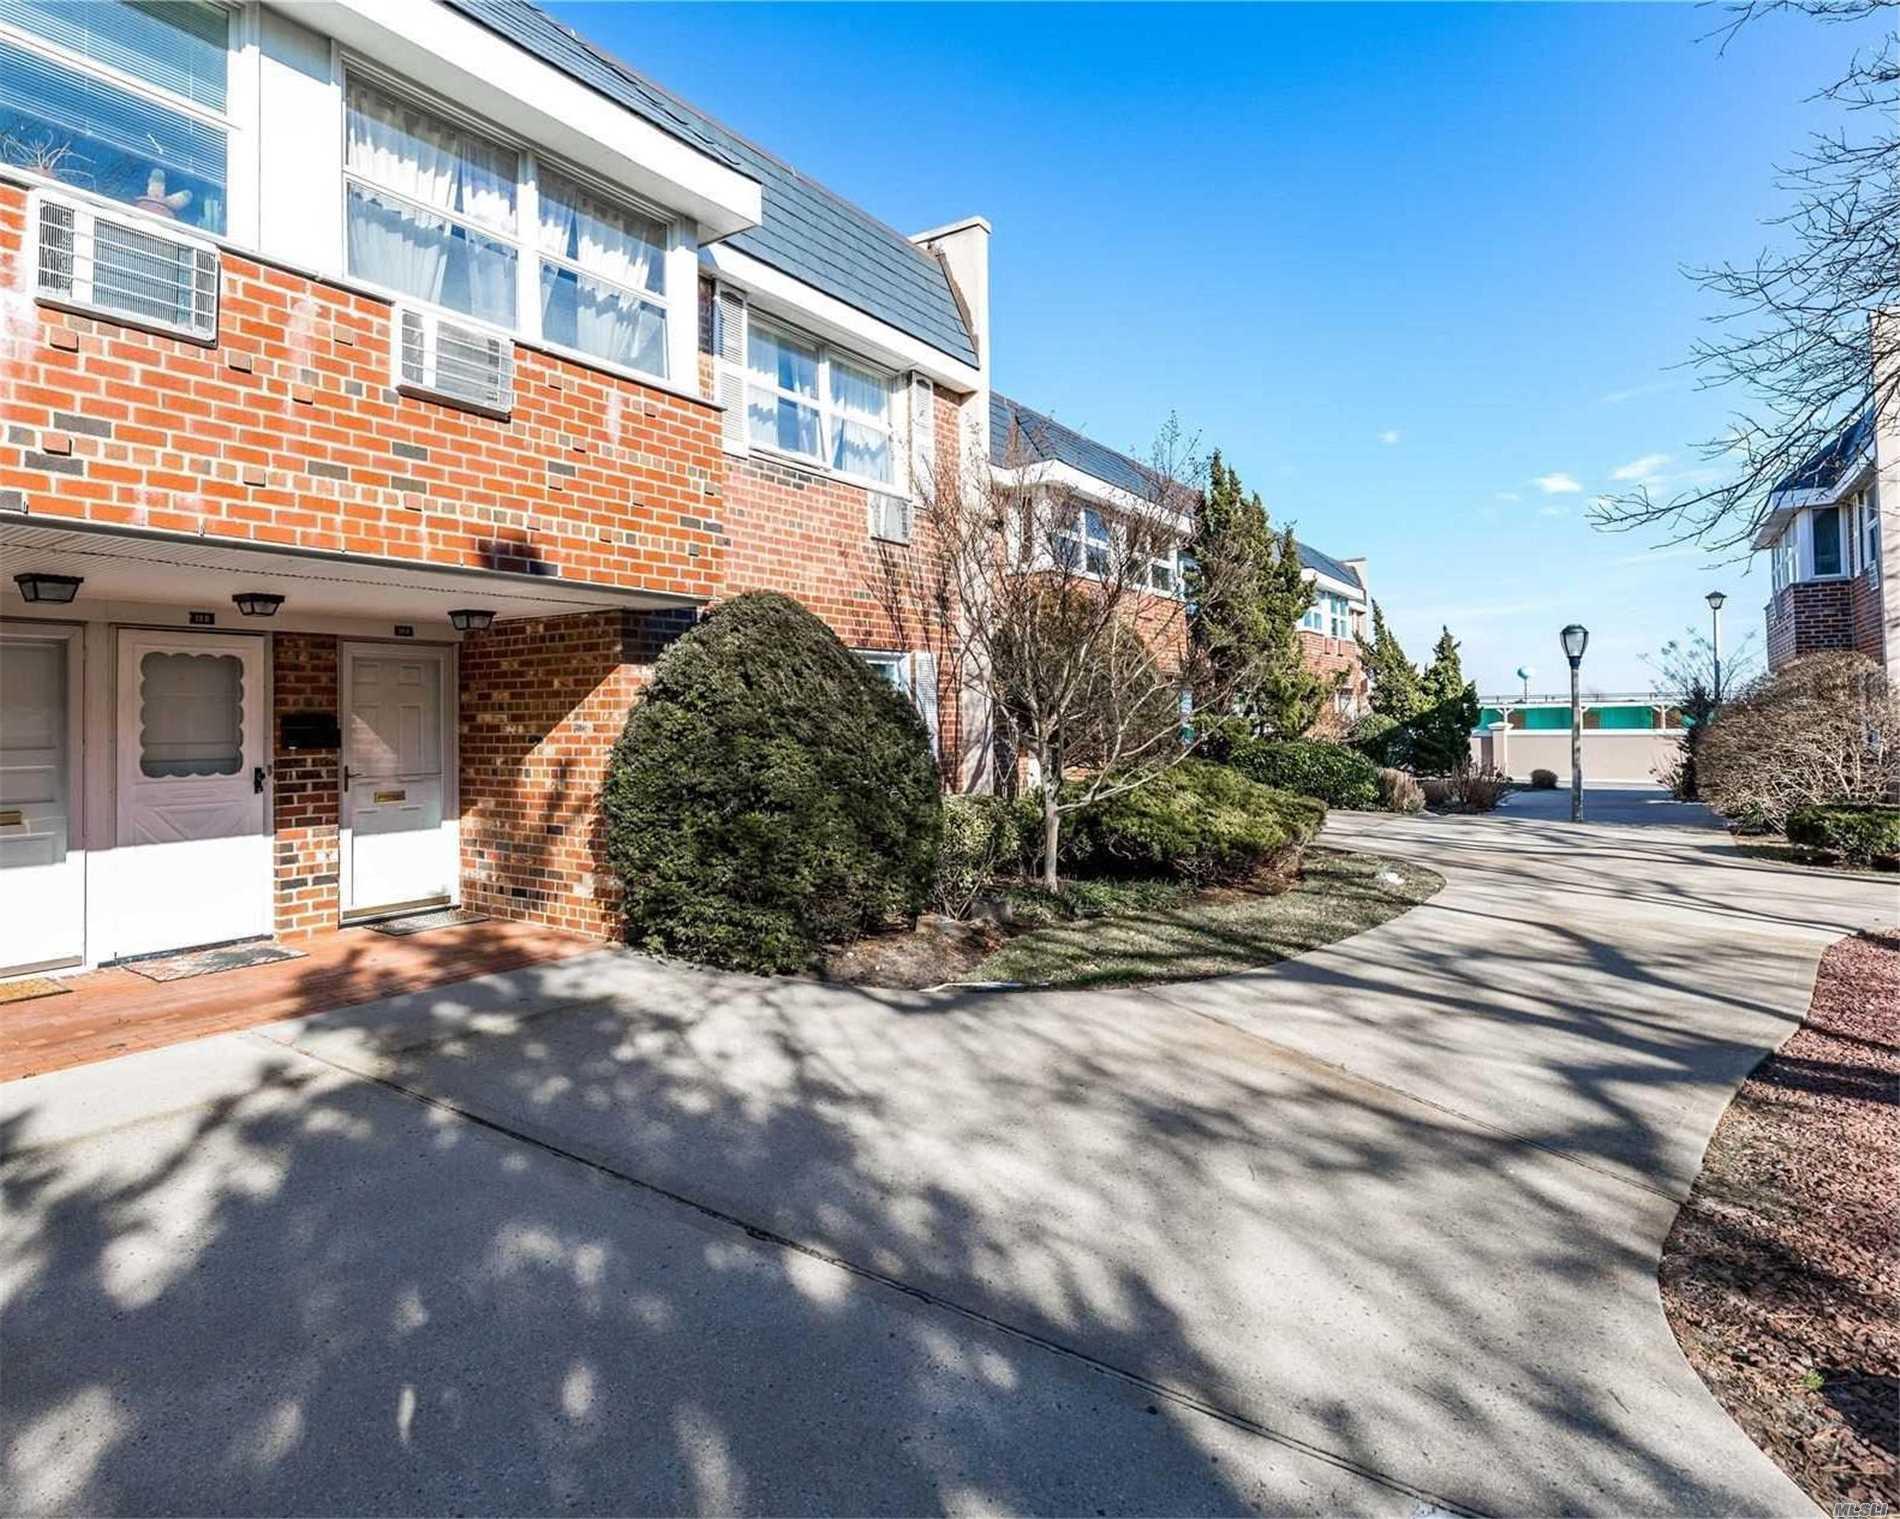 Property for sale at 750 Lido Boulevard # 19B, Lido Beach NY 11561, Lido Beach,  New York 11561